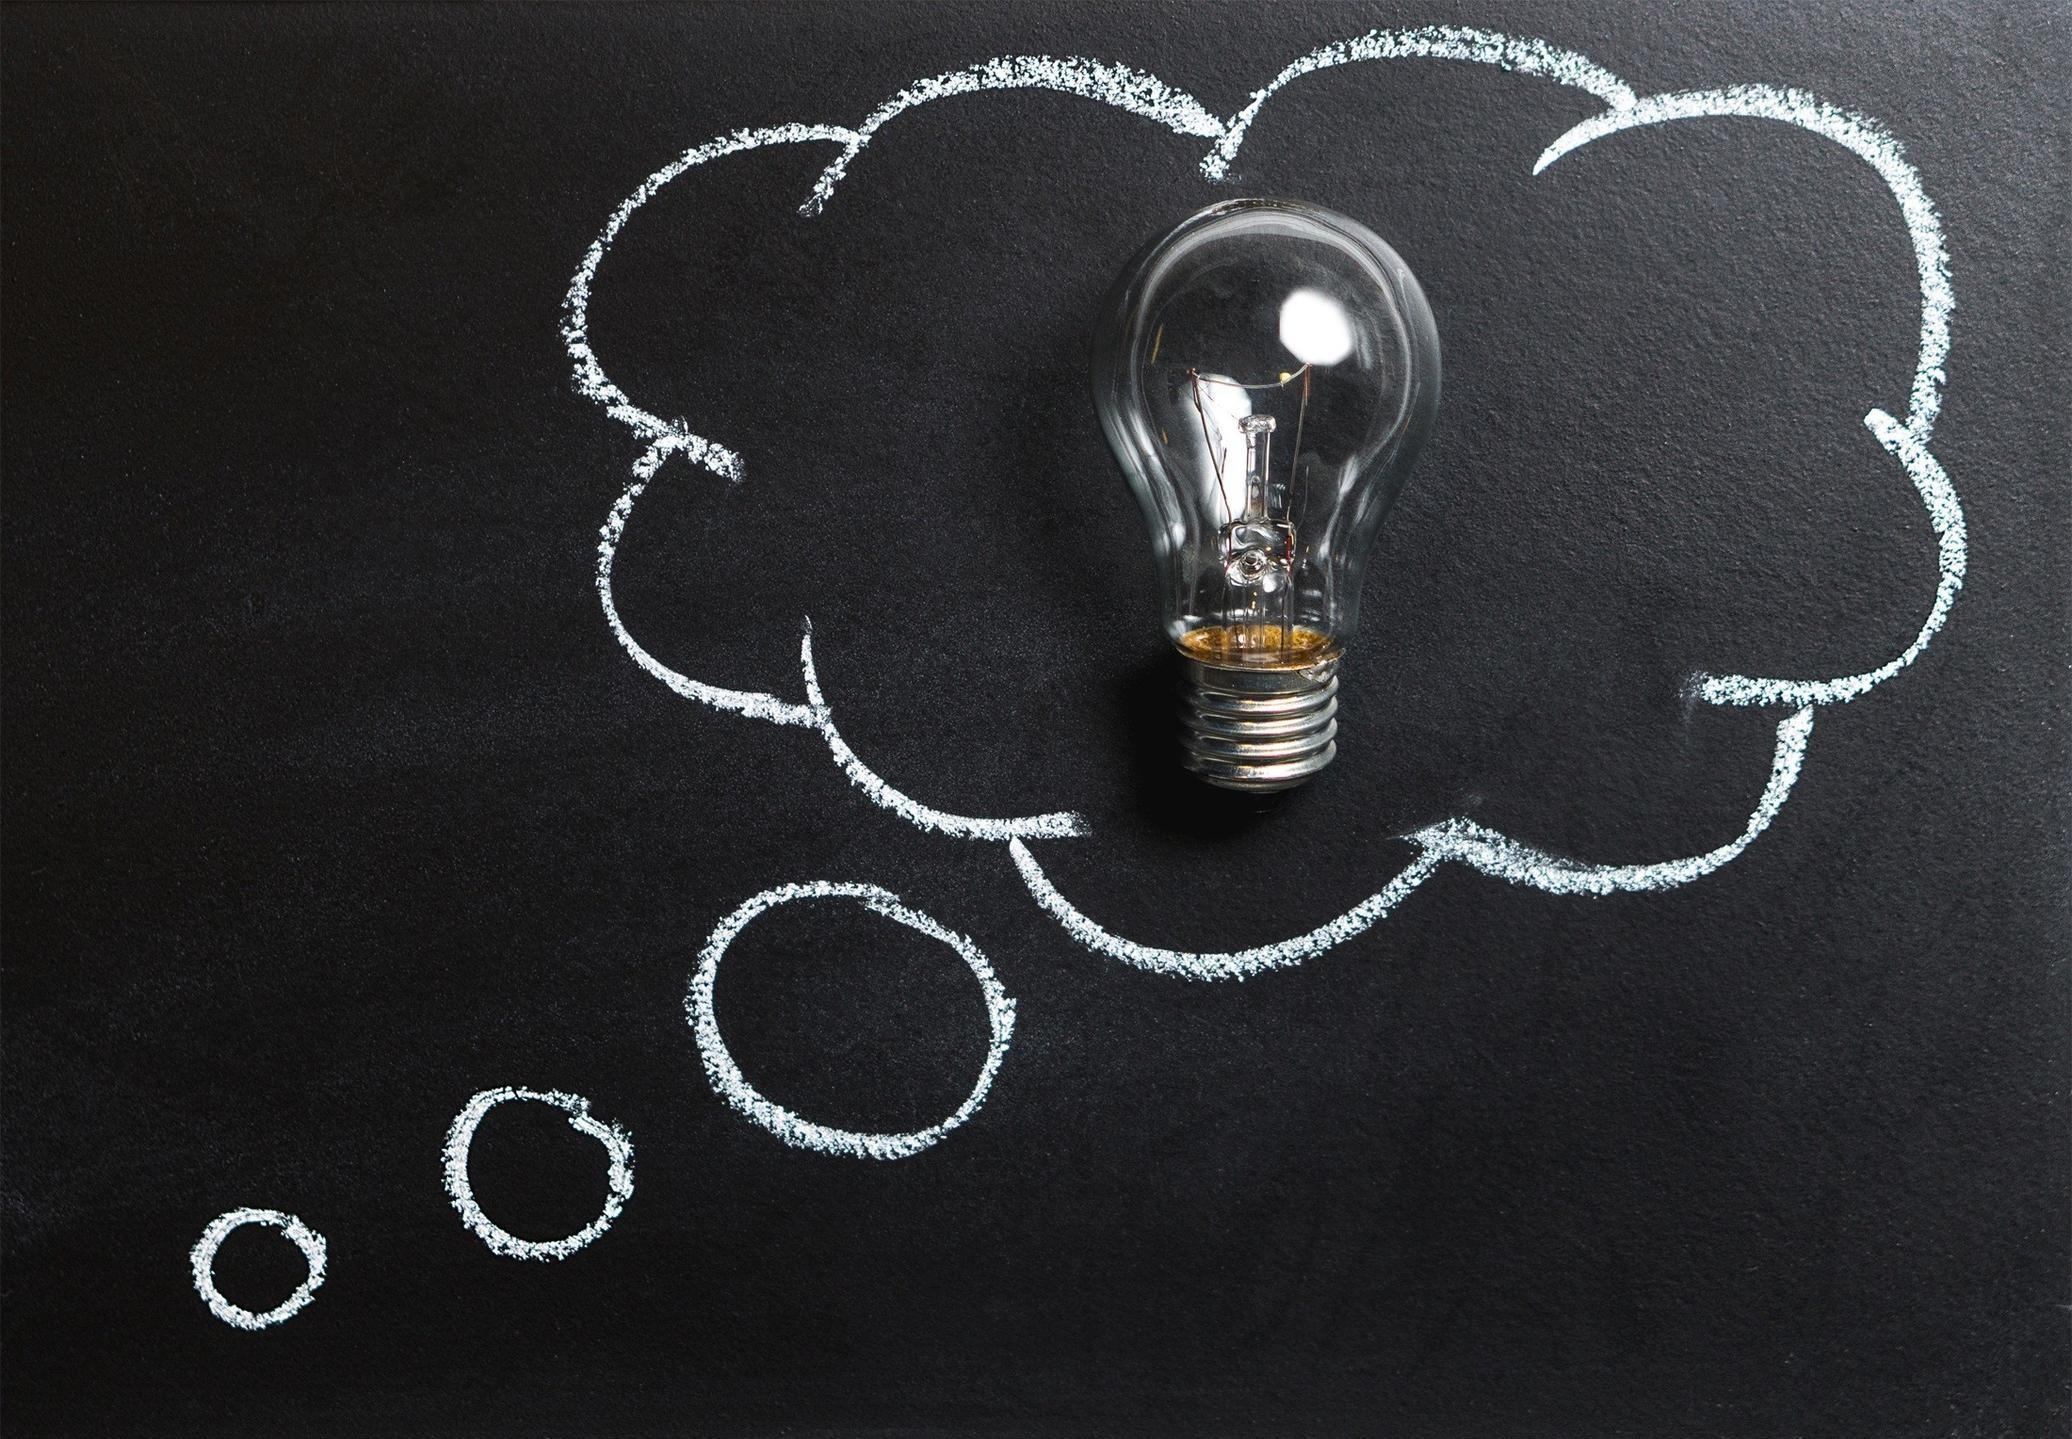 Black chalkboard drawn thought bubble lightbulb